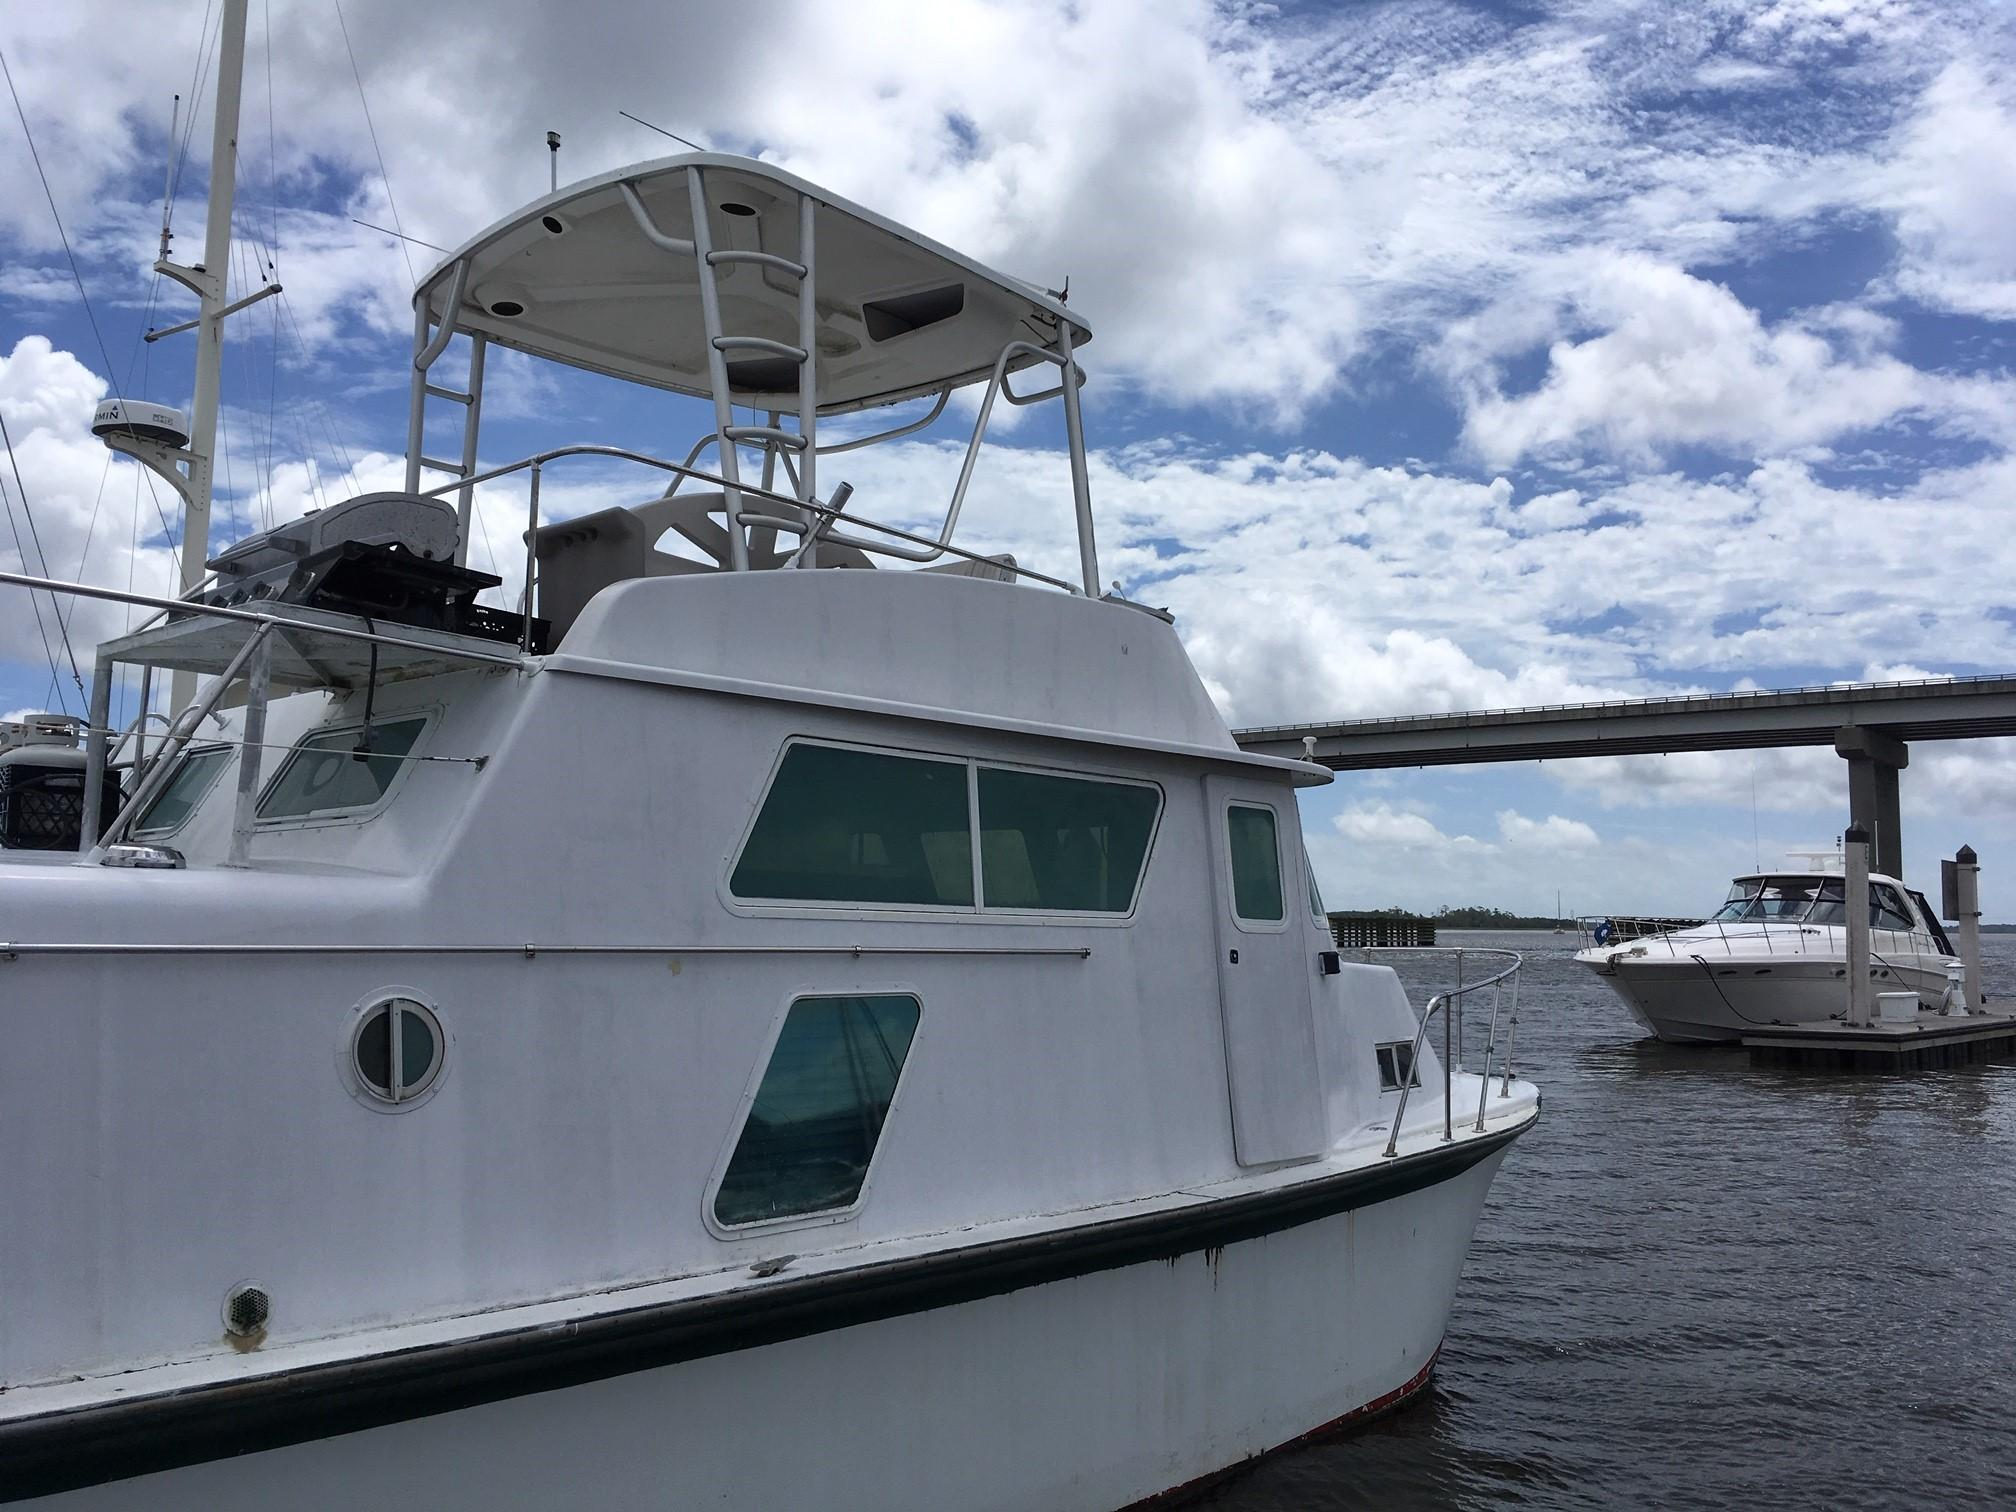 Carri-craft 57-ft Power Catamaran - Carri-craft starboard